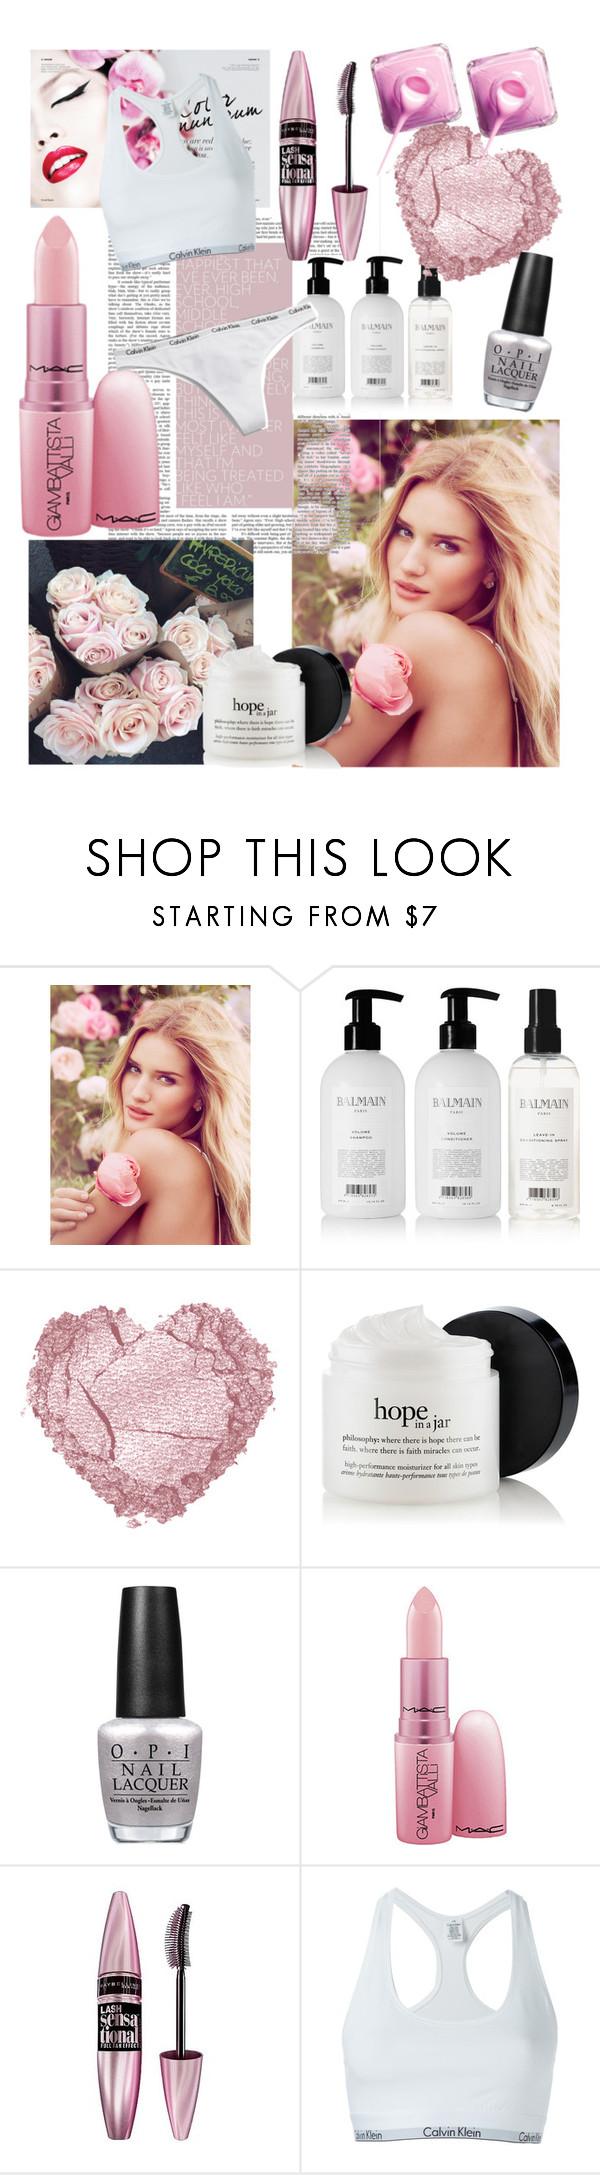 """Beauty edit"" by yana-esterman on Polyvore featuring beauty, M&S, Prada, Balmain, OPI, Giambattista Valli, Maybelline and Calvin Klein Underwear"